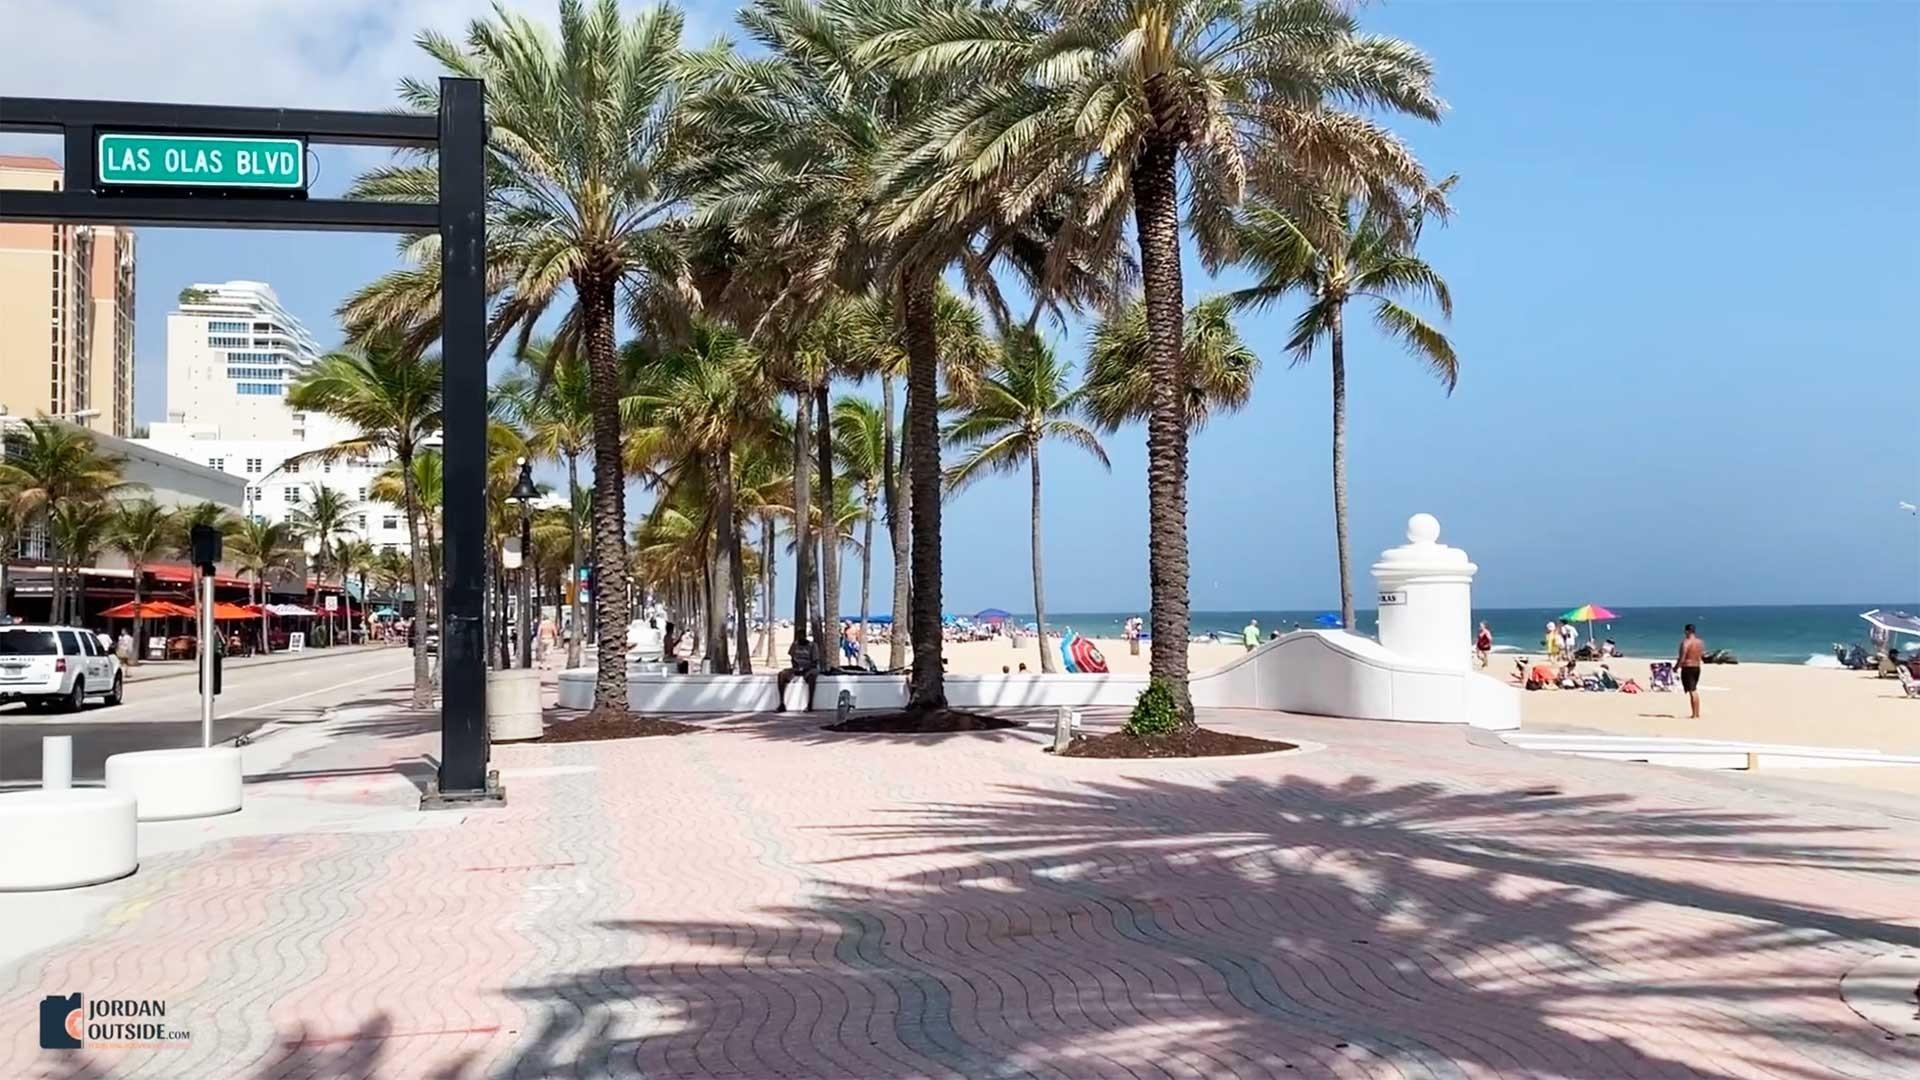 Las Olas Blvd, Ft. Lauderdale Beach